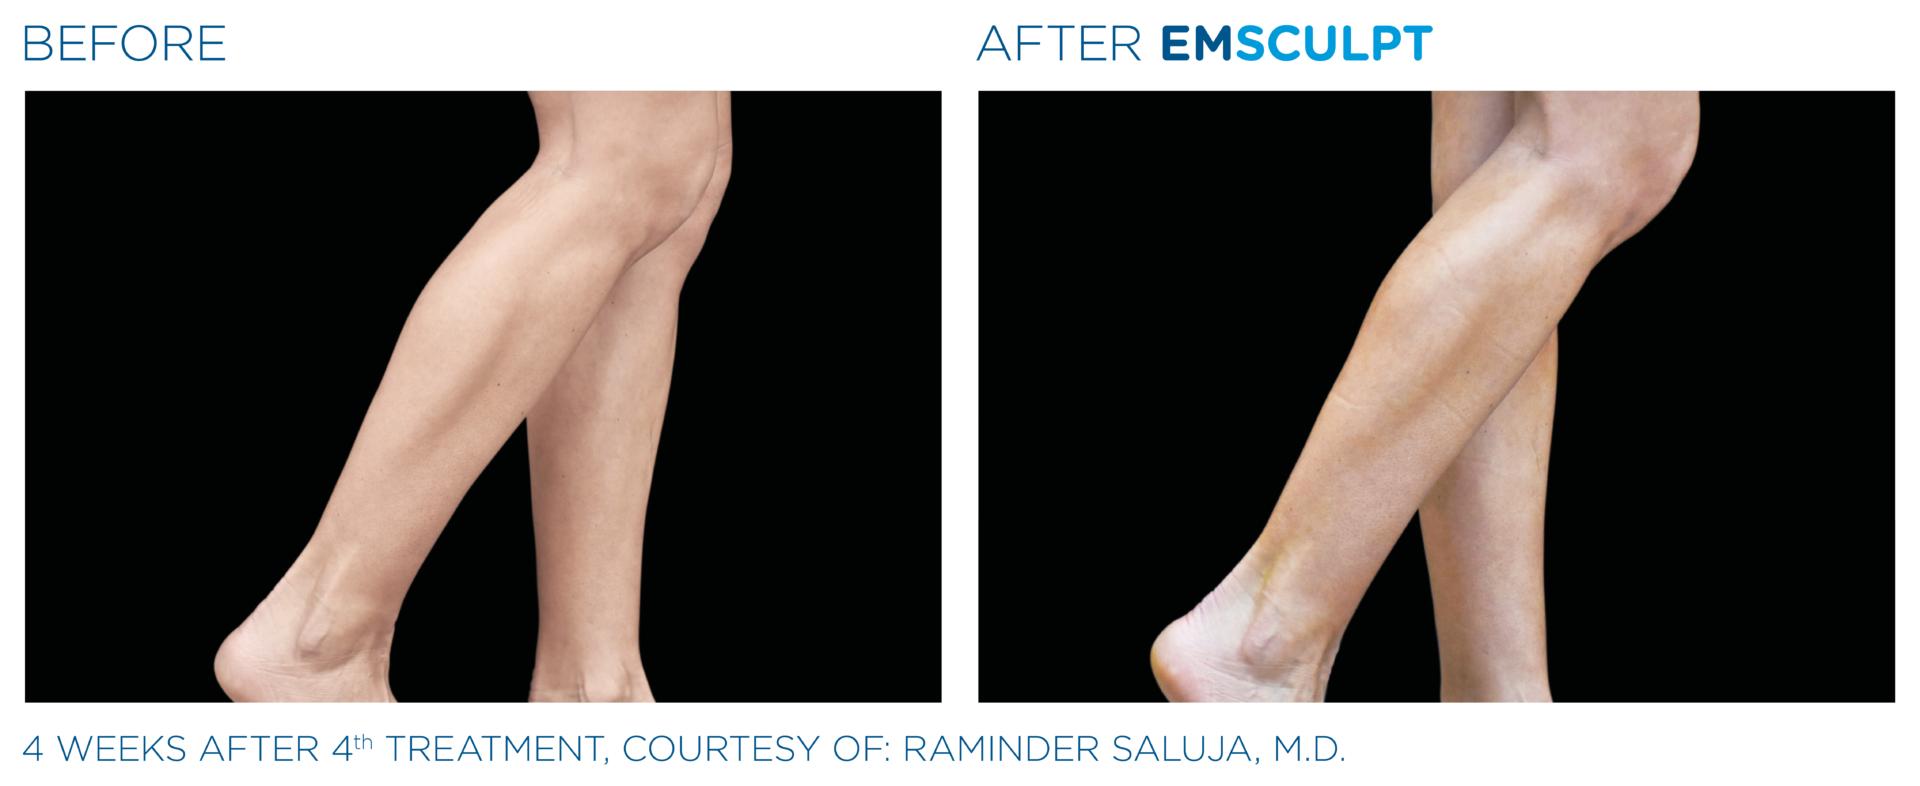 Build calf muscles with EMSCULPT Southampton aesthetics clinic